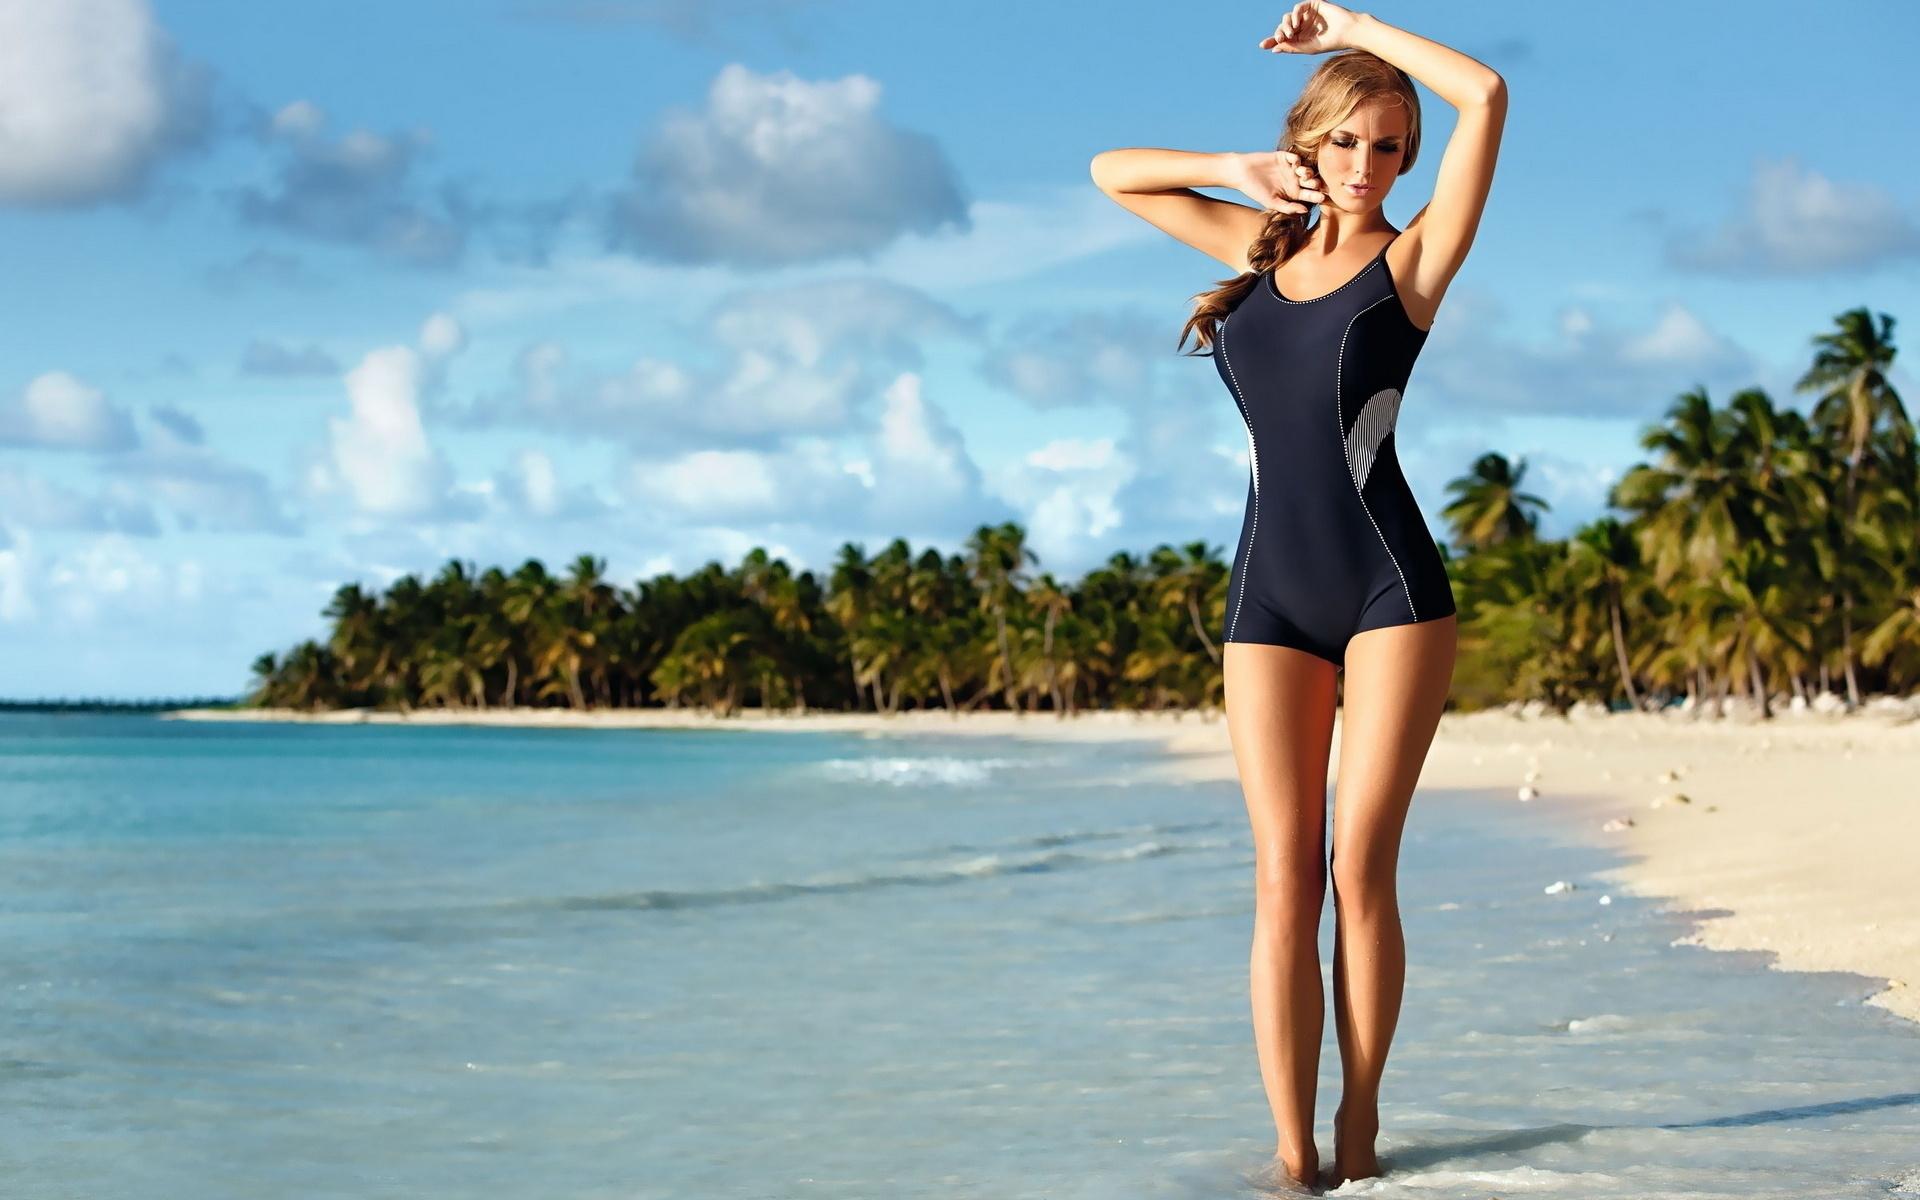 Подруге картинка, картинки с пляжа девушки